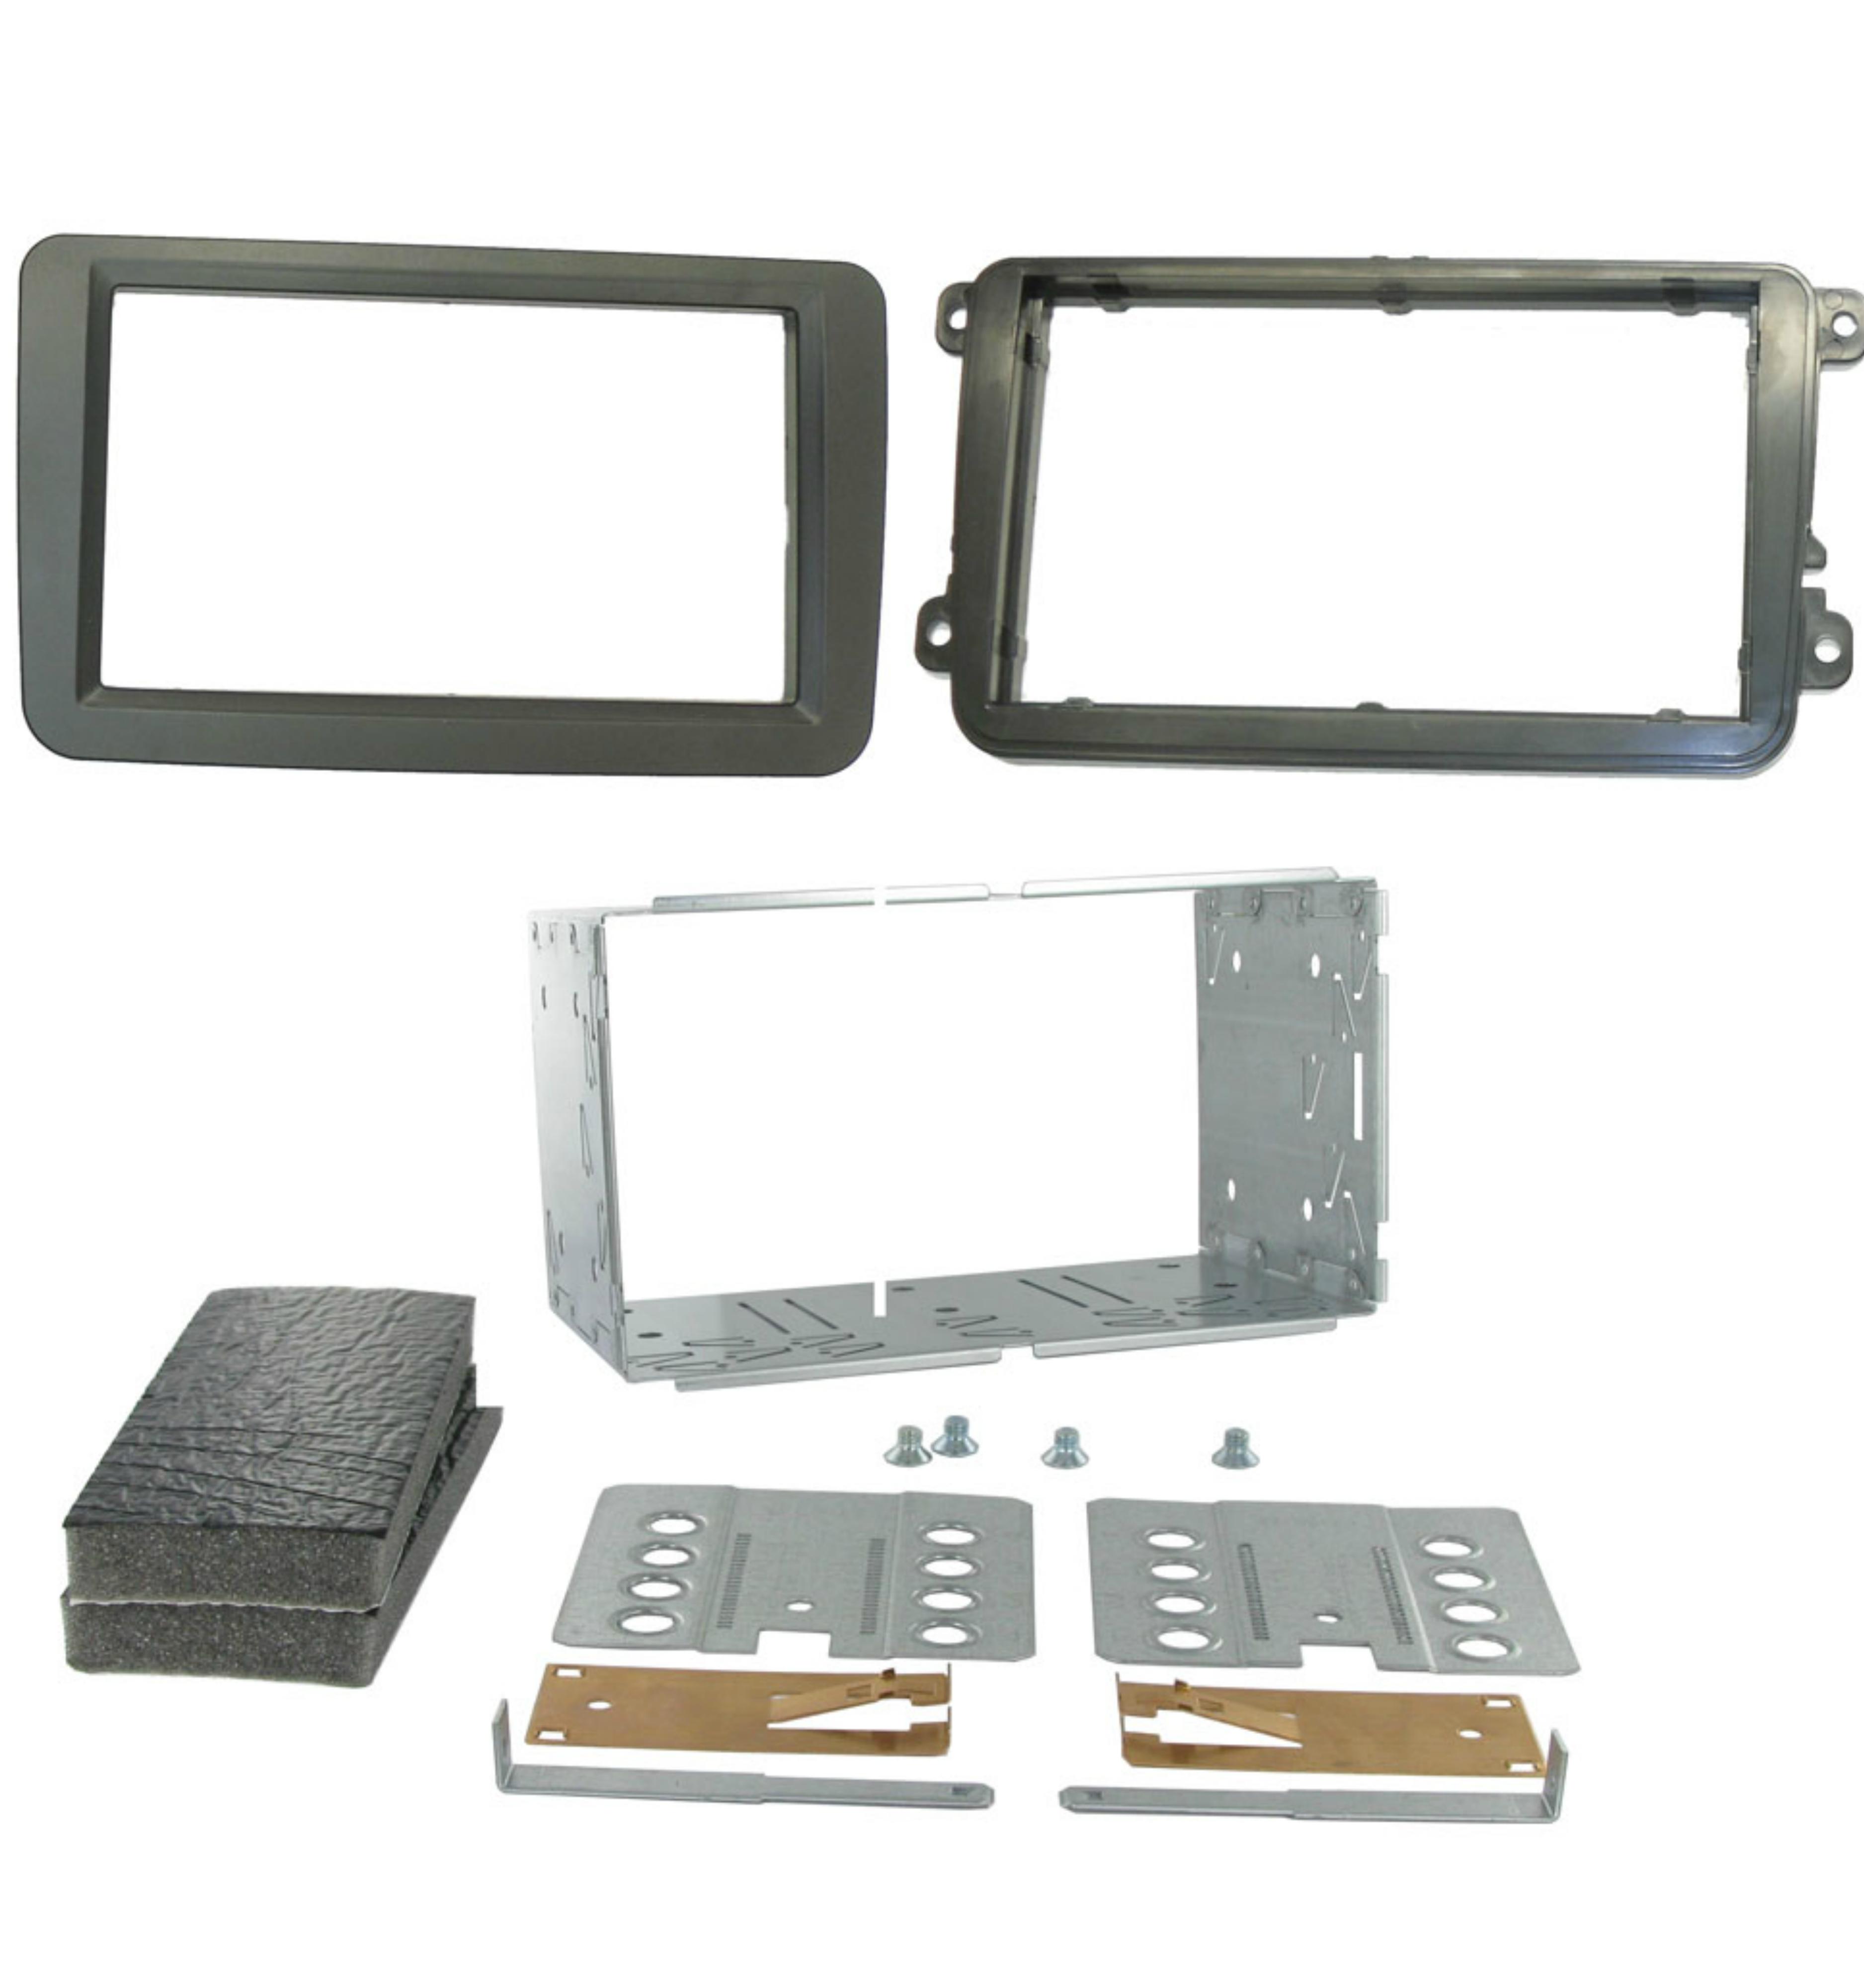 C2 23VW01 Car Stereo Double Din Fascia Plate Adaptor Volkswagen Passat/Golf/Polo